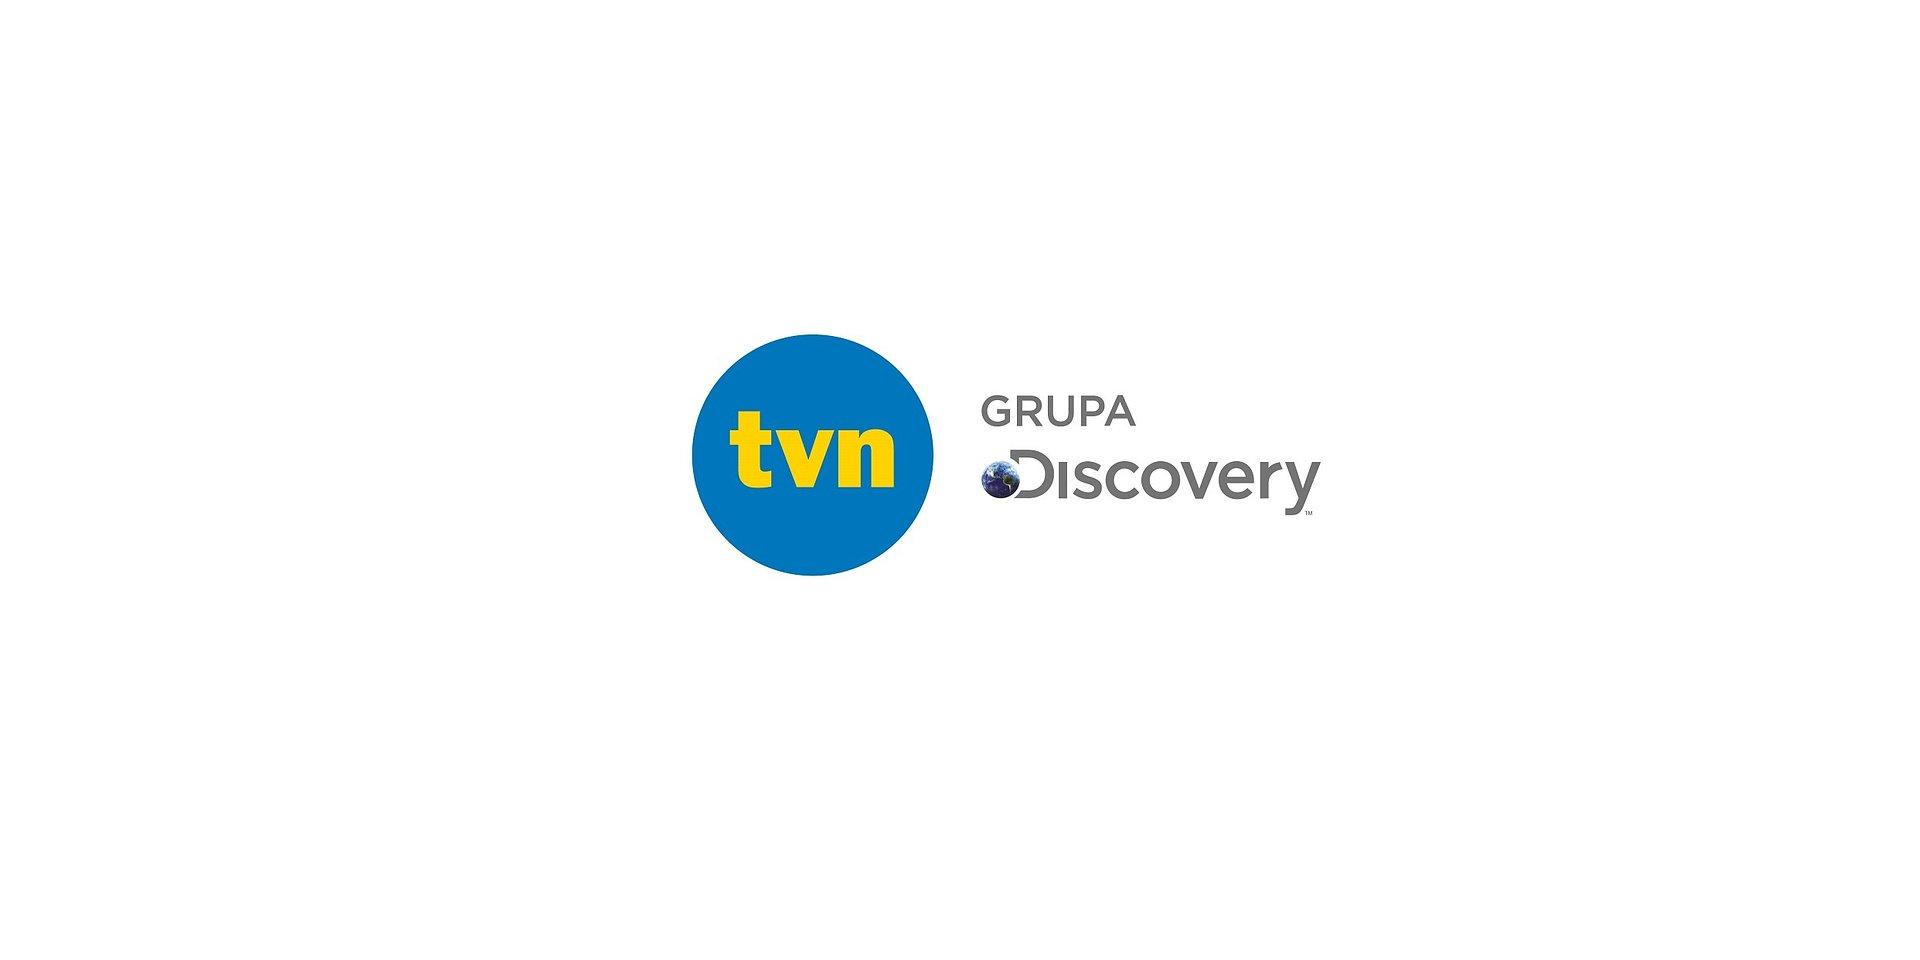 TVN Grupa Discovery liderem polskiego rynku TV i digital